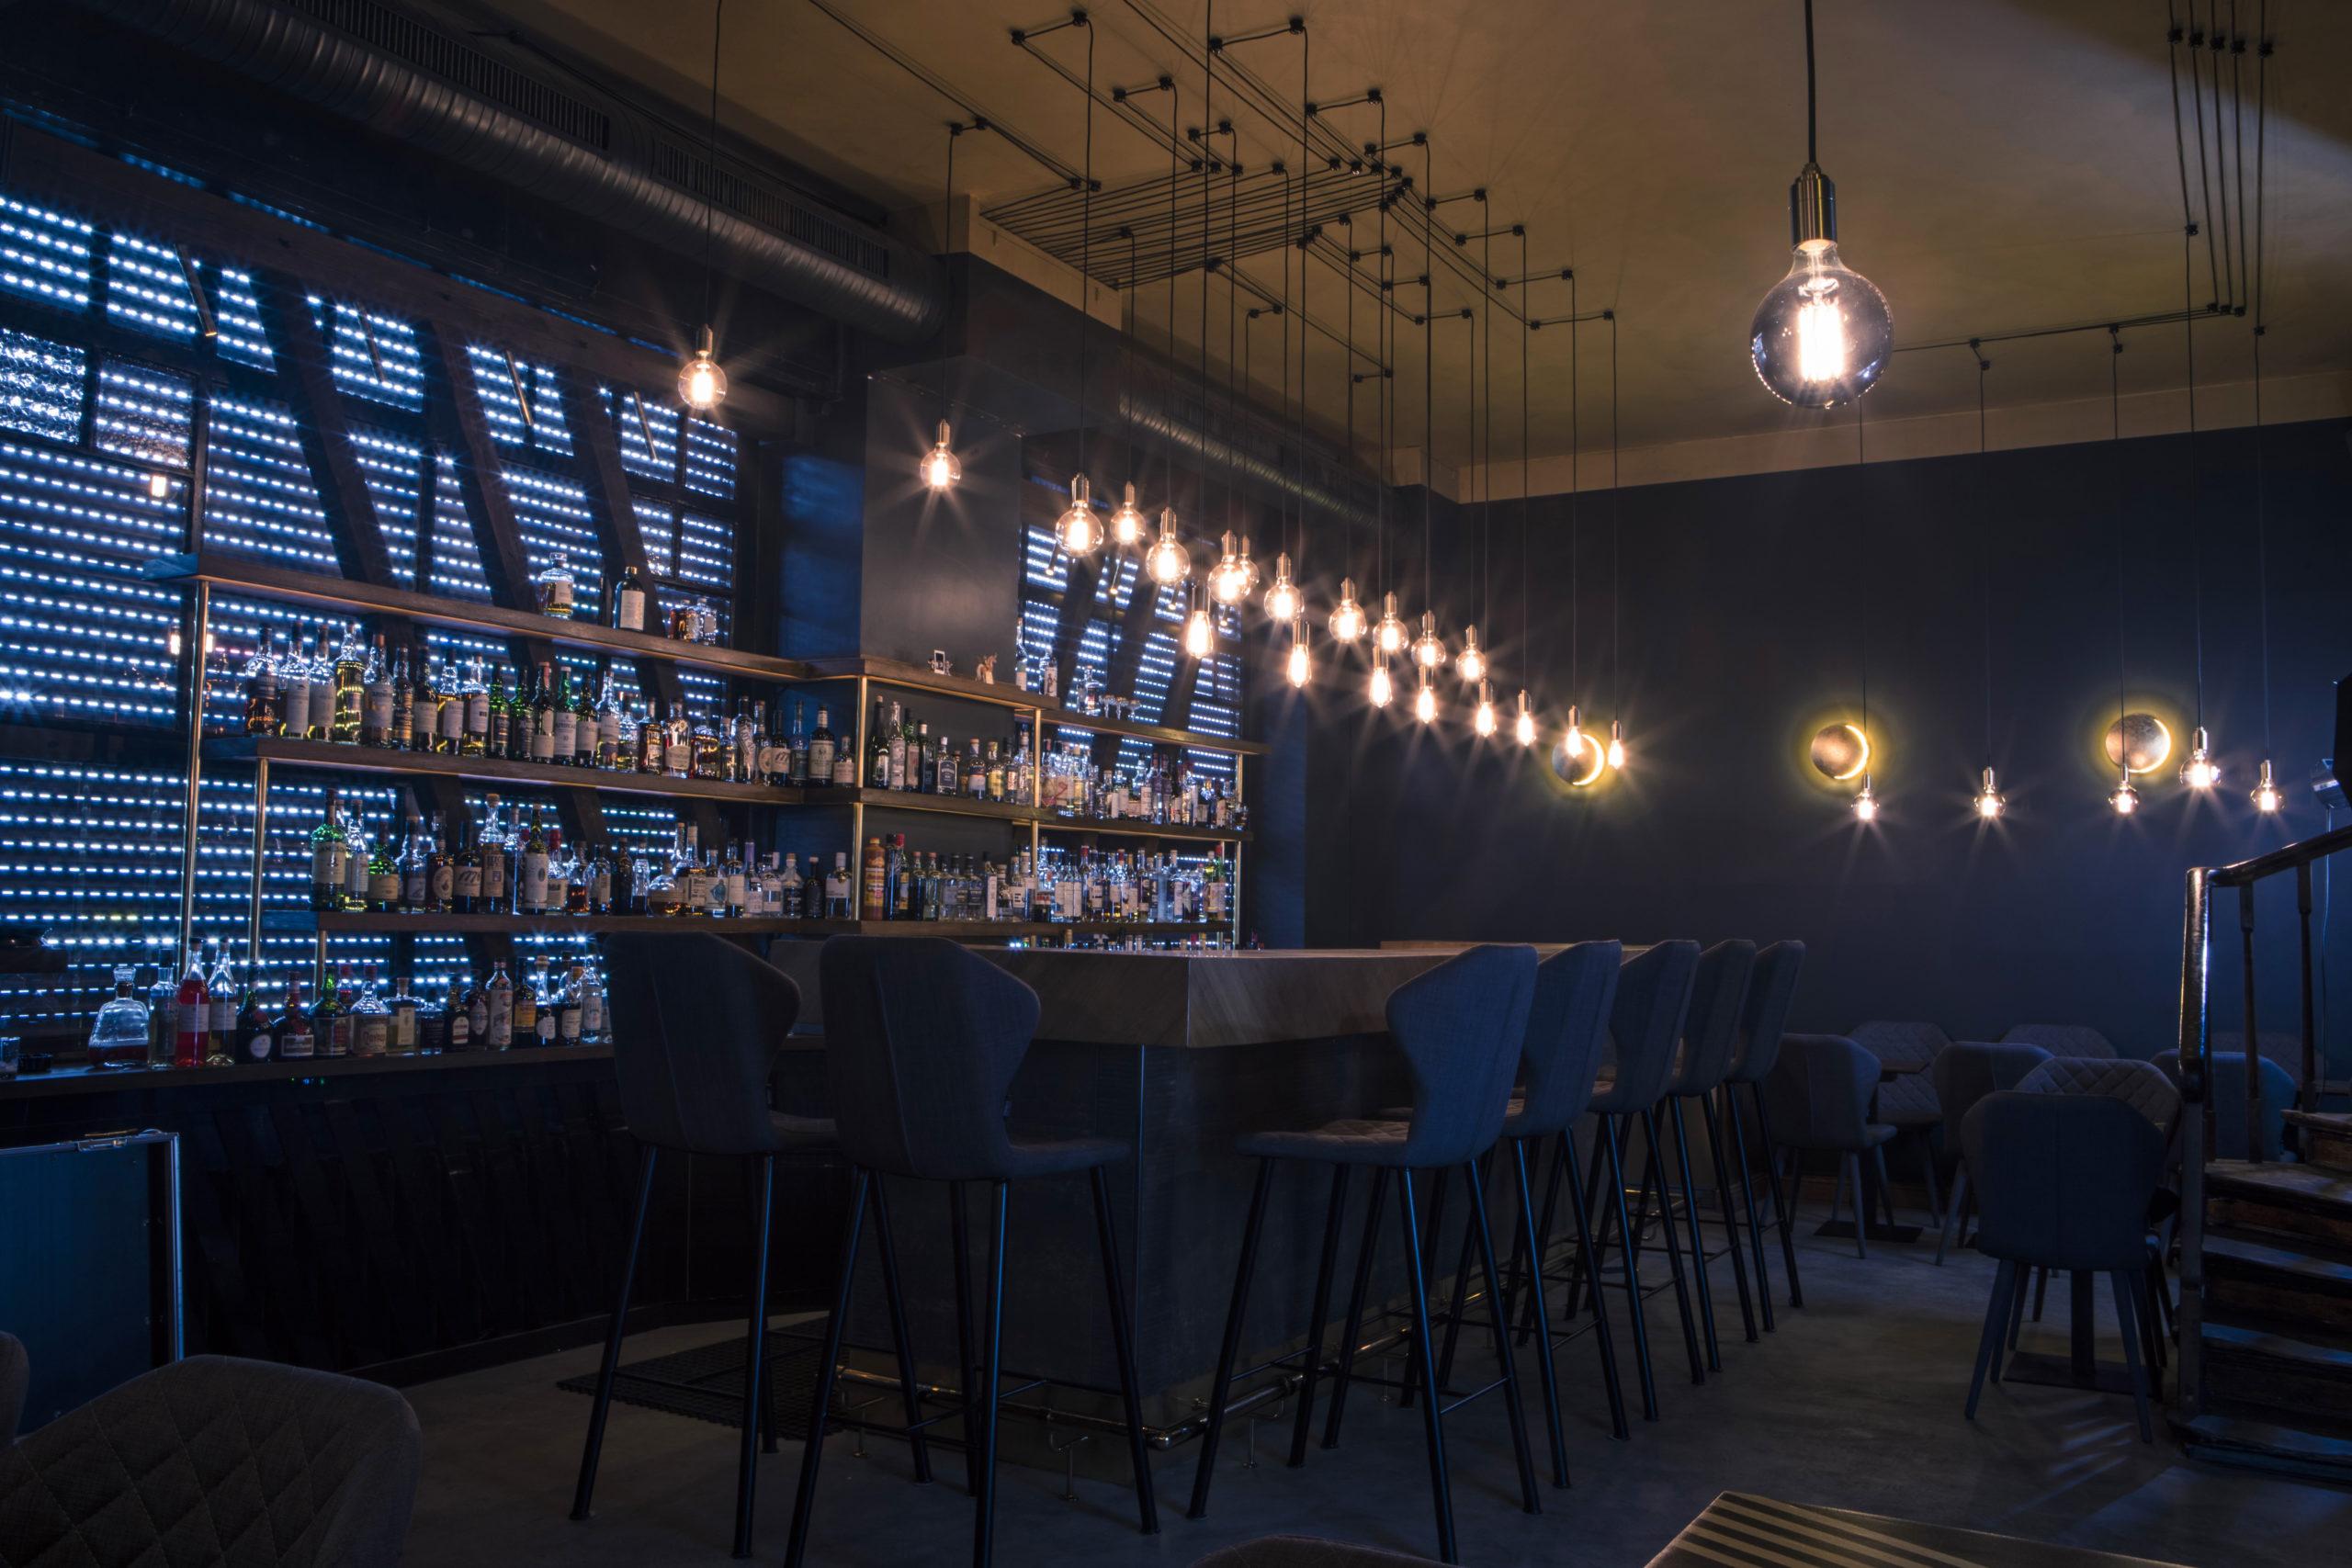 Außengastronomie öffnet in Berlin Velvet Bar Tresen Innenraum